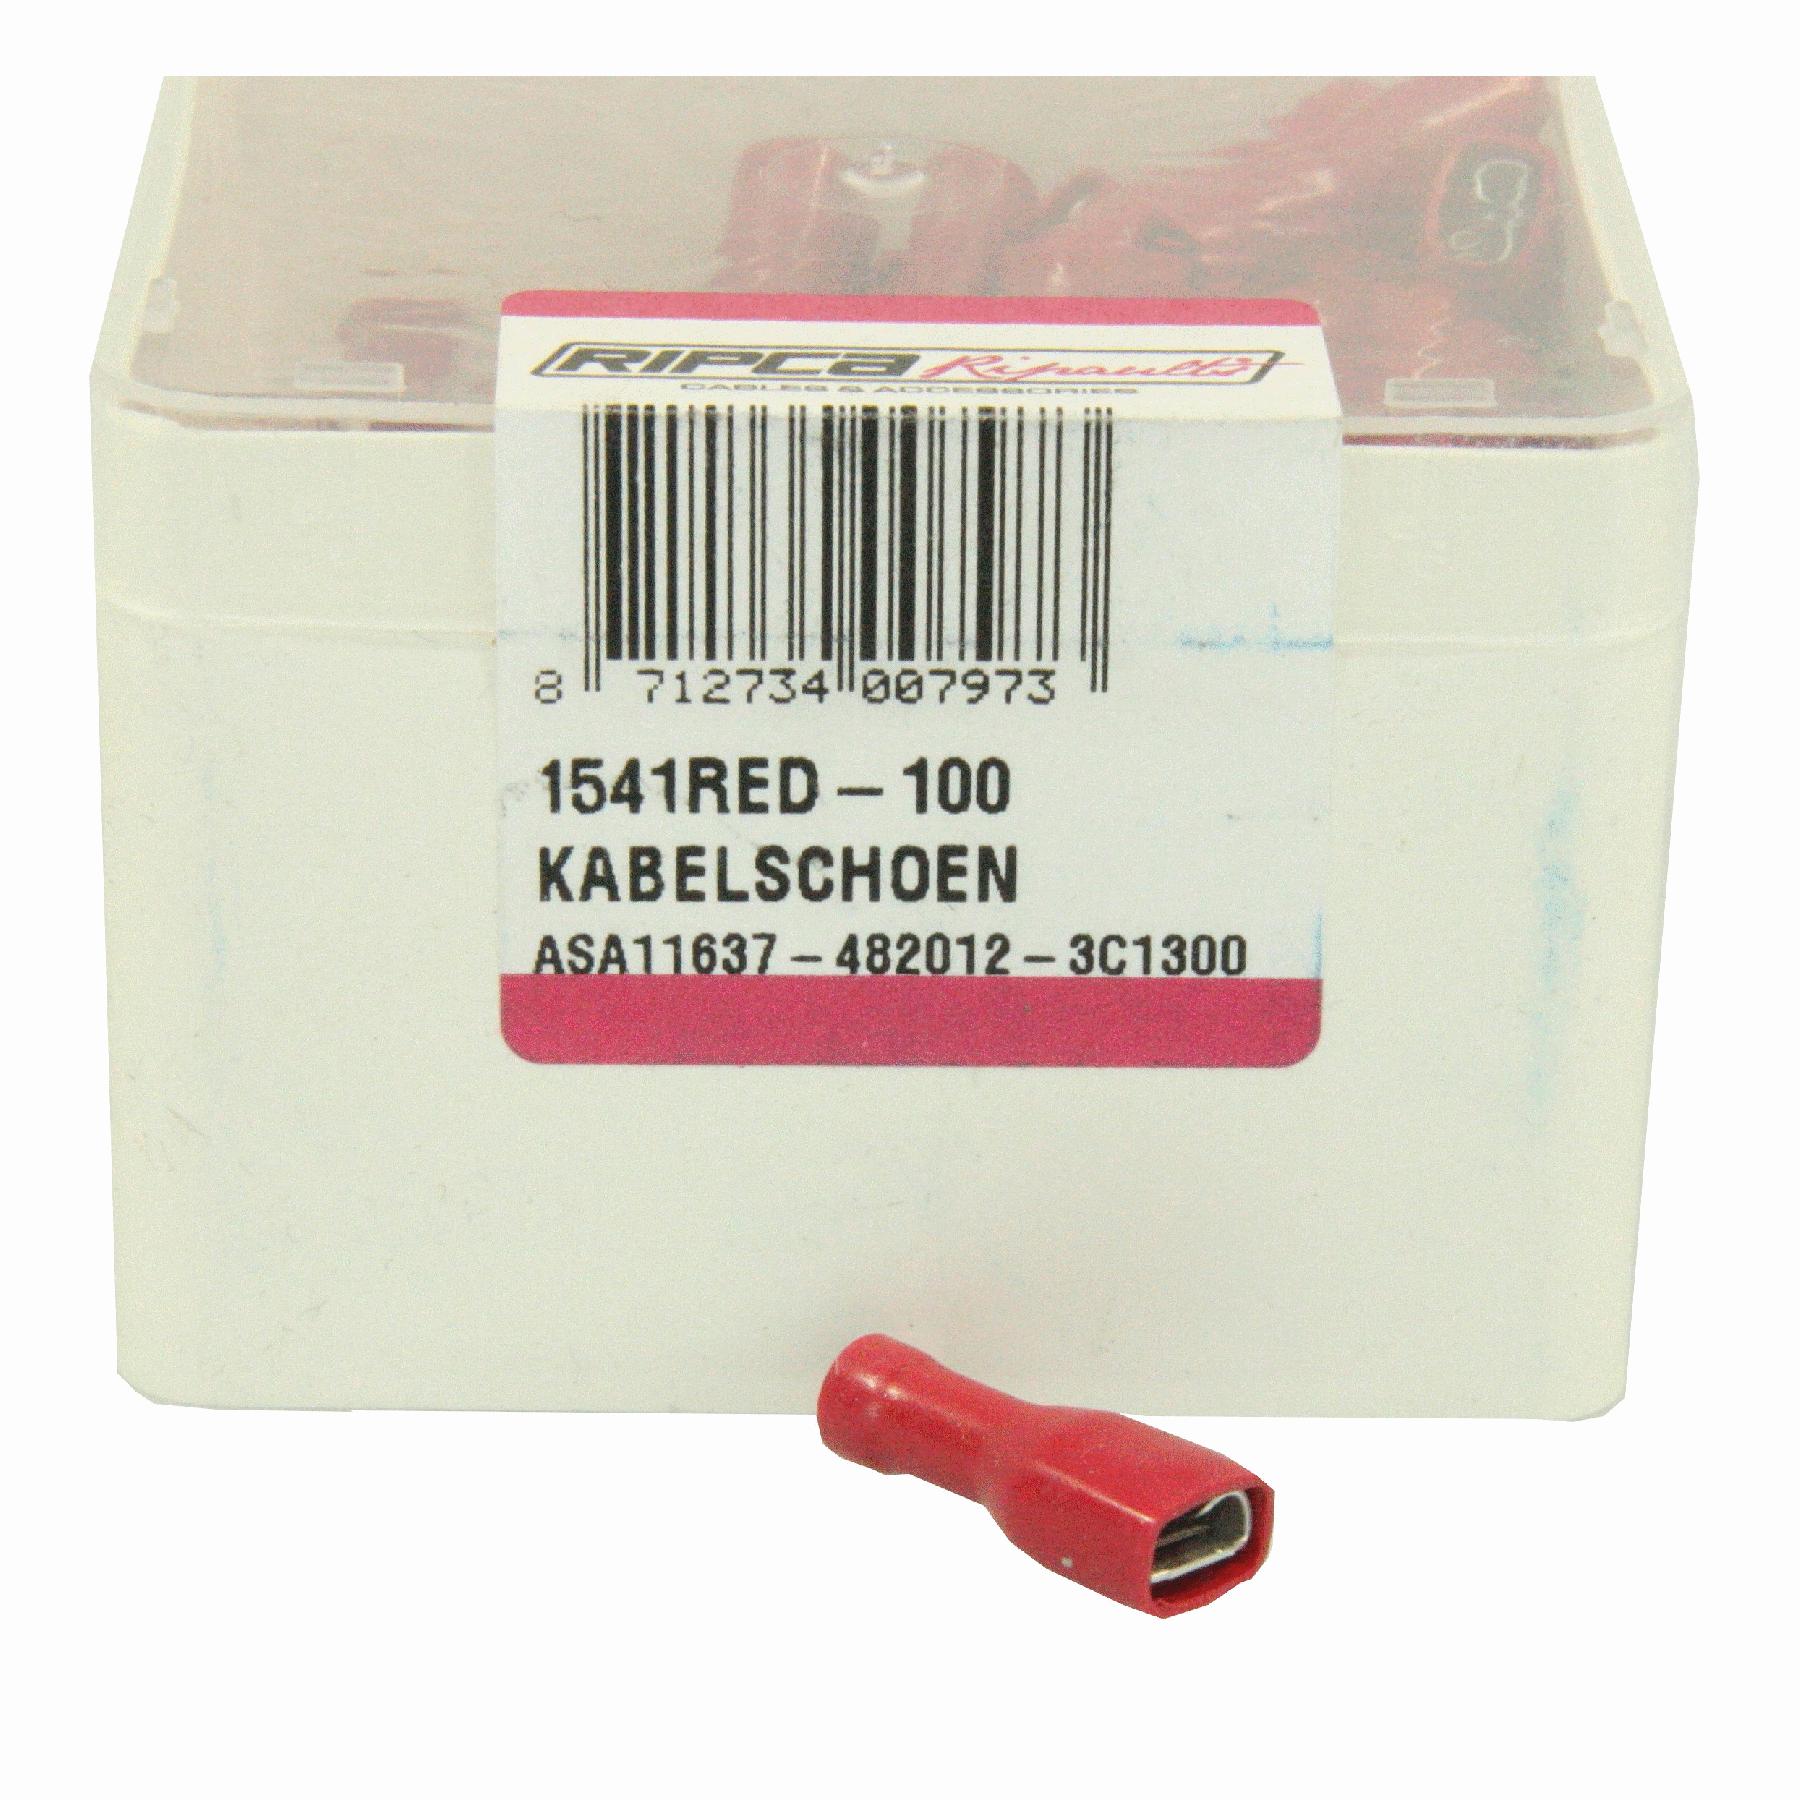 ds. Kabelschoenen 1541 (100)